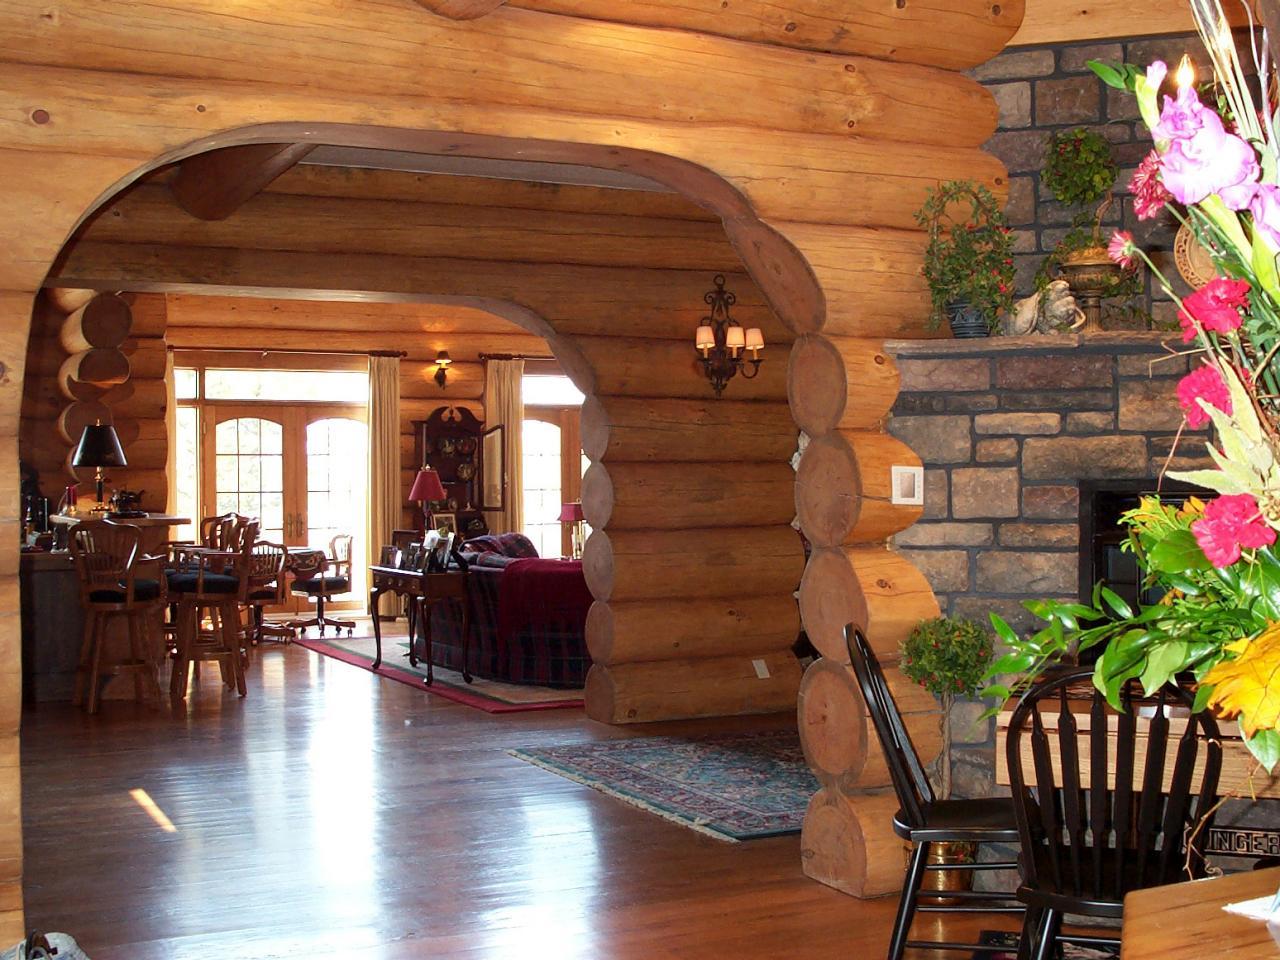 Dream Log Homes | DIY Network Blog Cabin 2010 | DIY